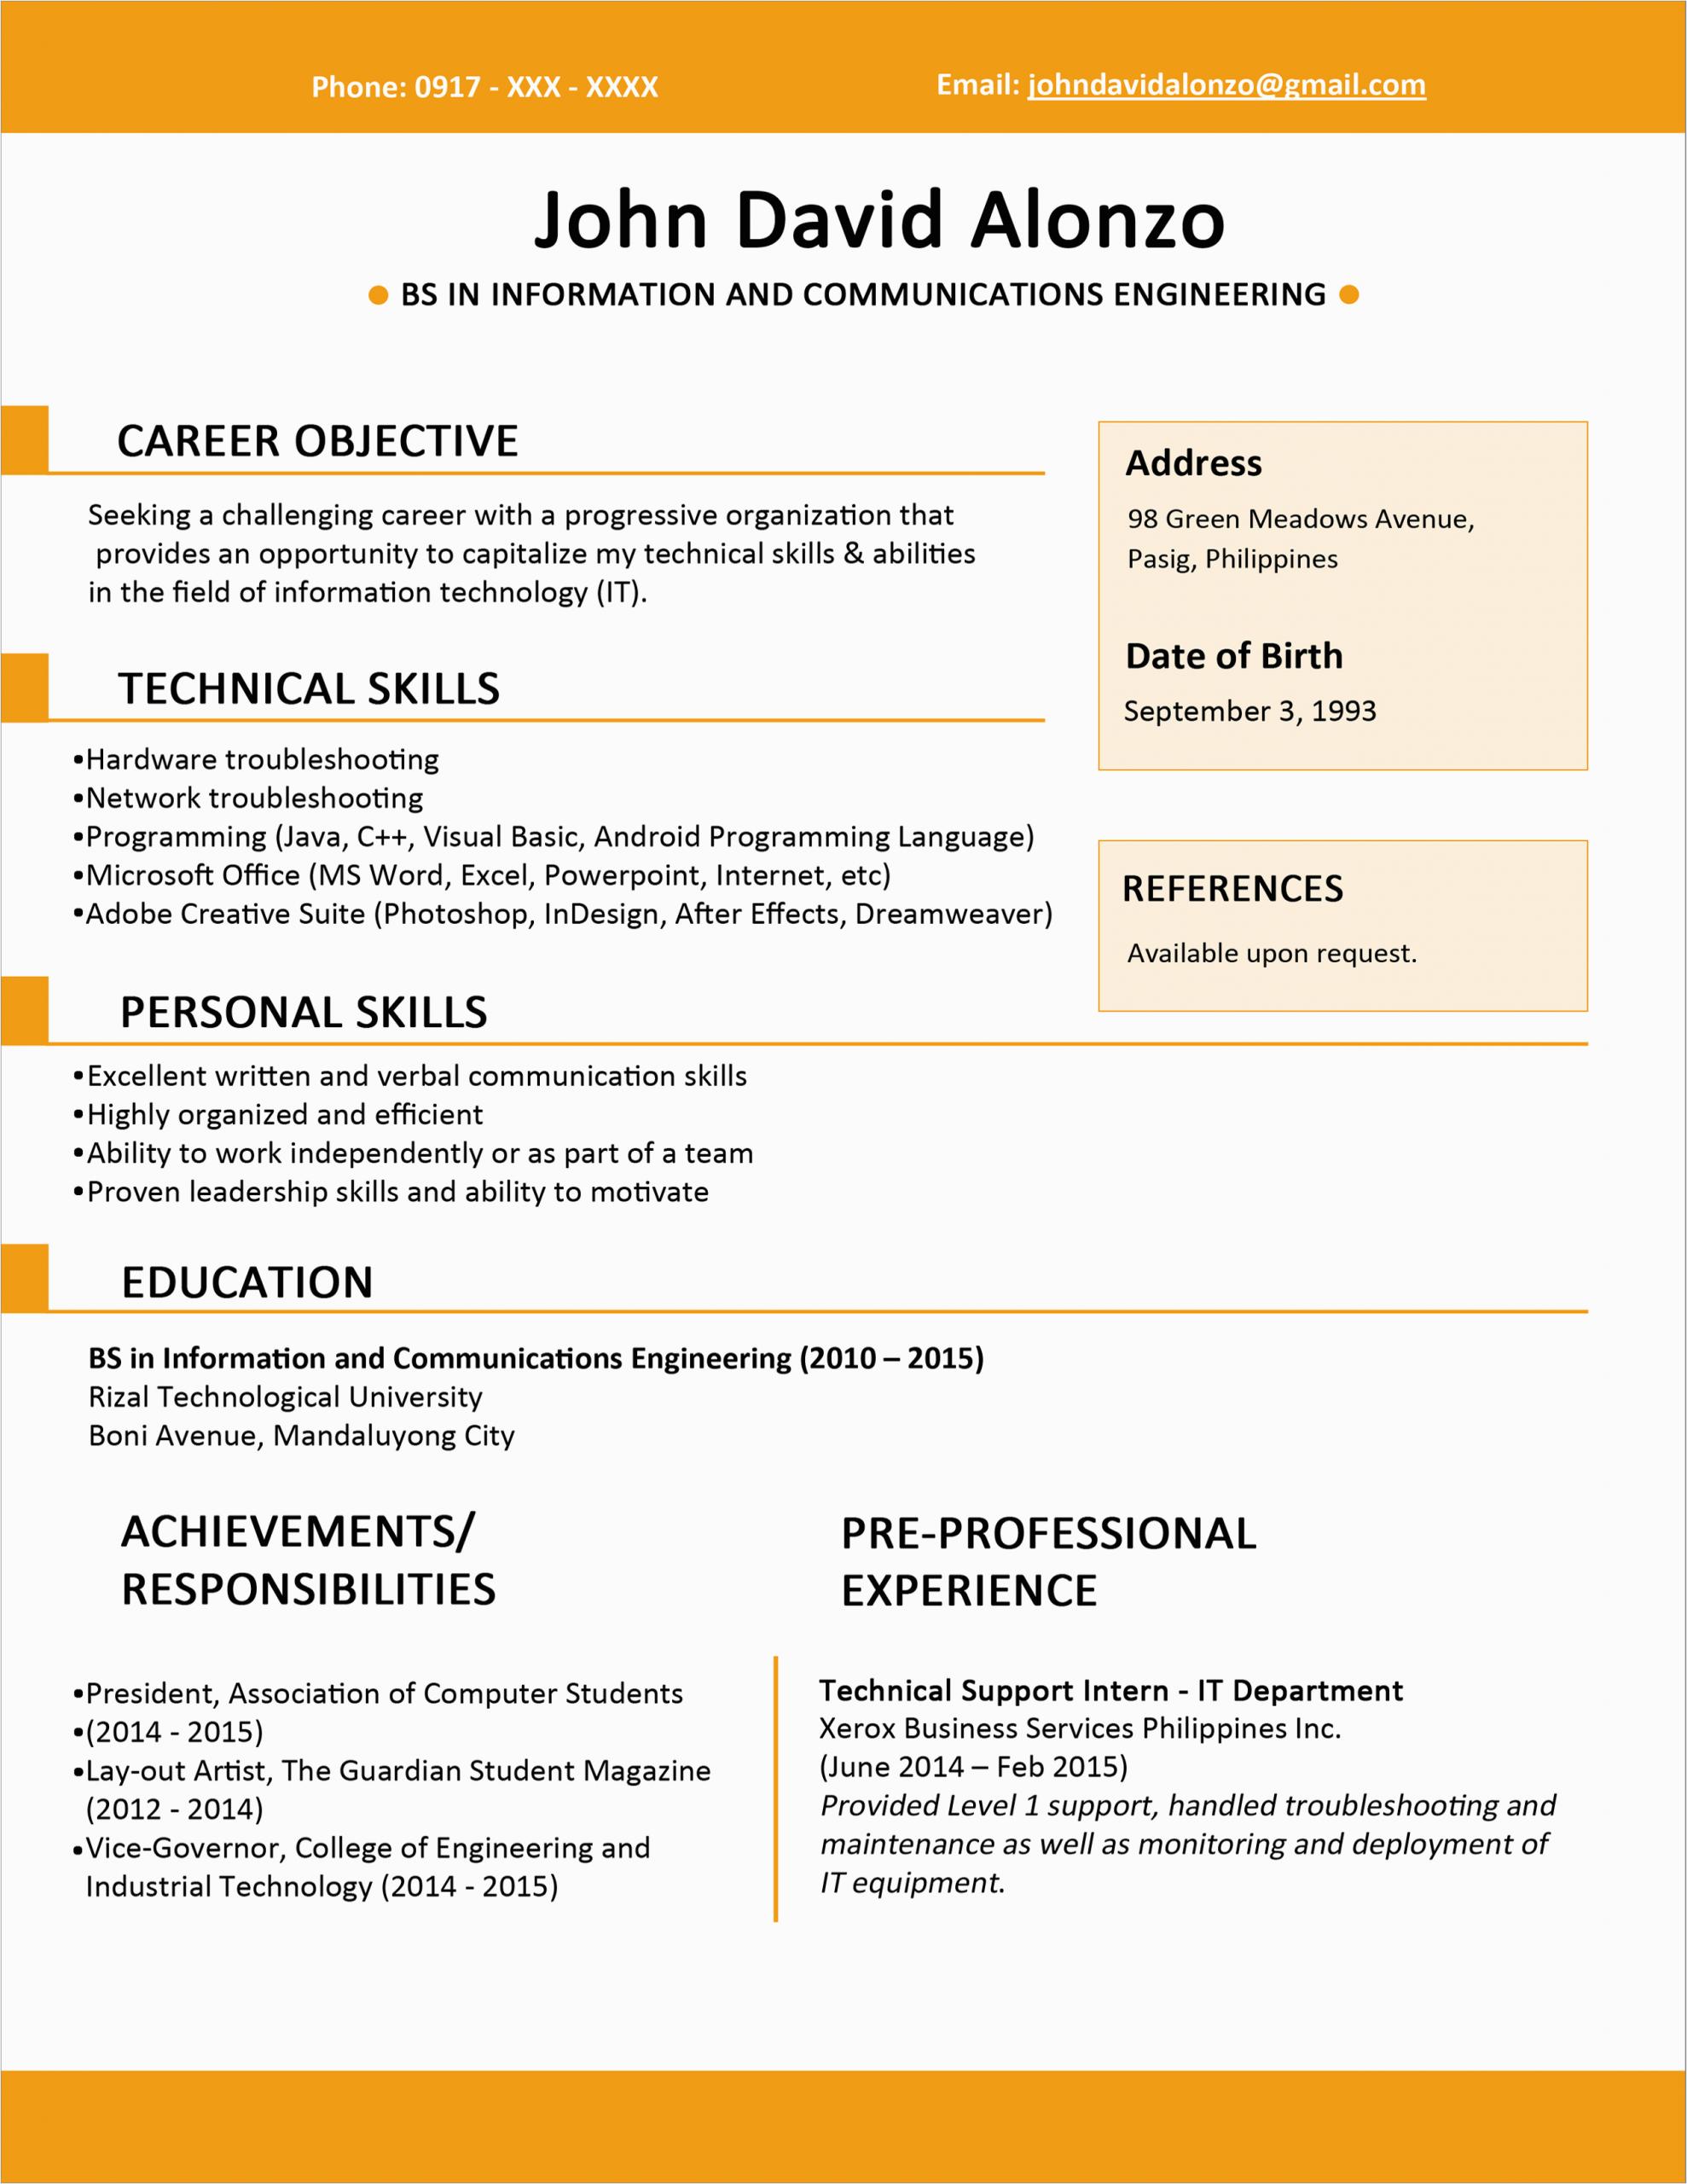 Sample Resume Title for Fresh Graduates Sample Resume format for Fresh Graduates E Page format